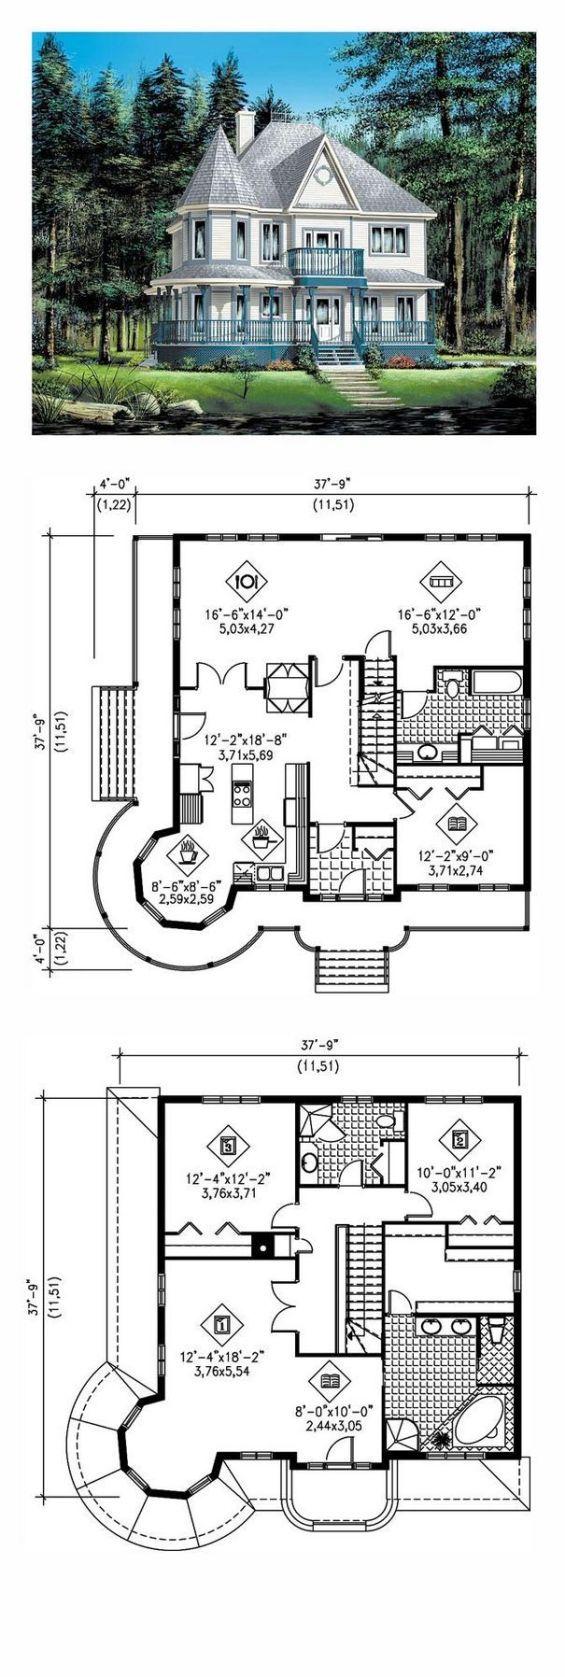 Victorian house colors ideas 2